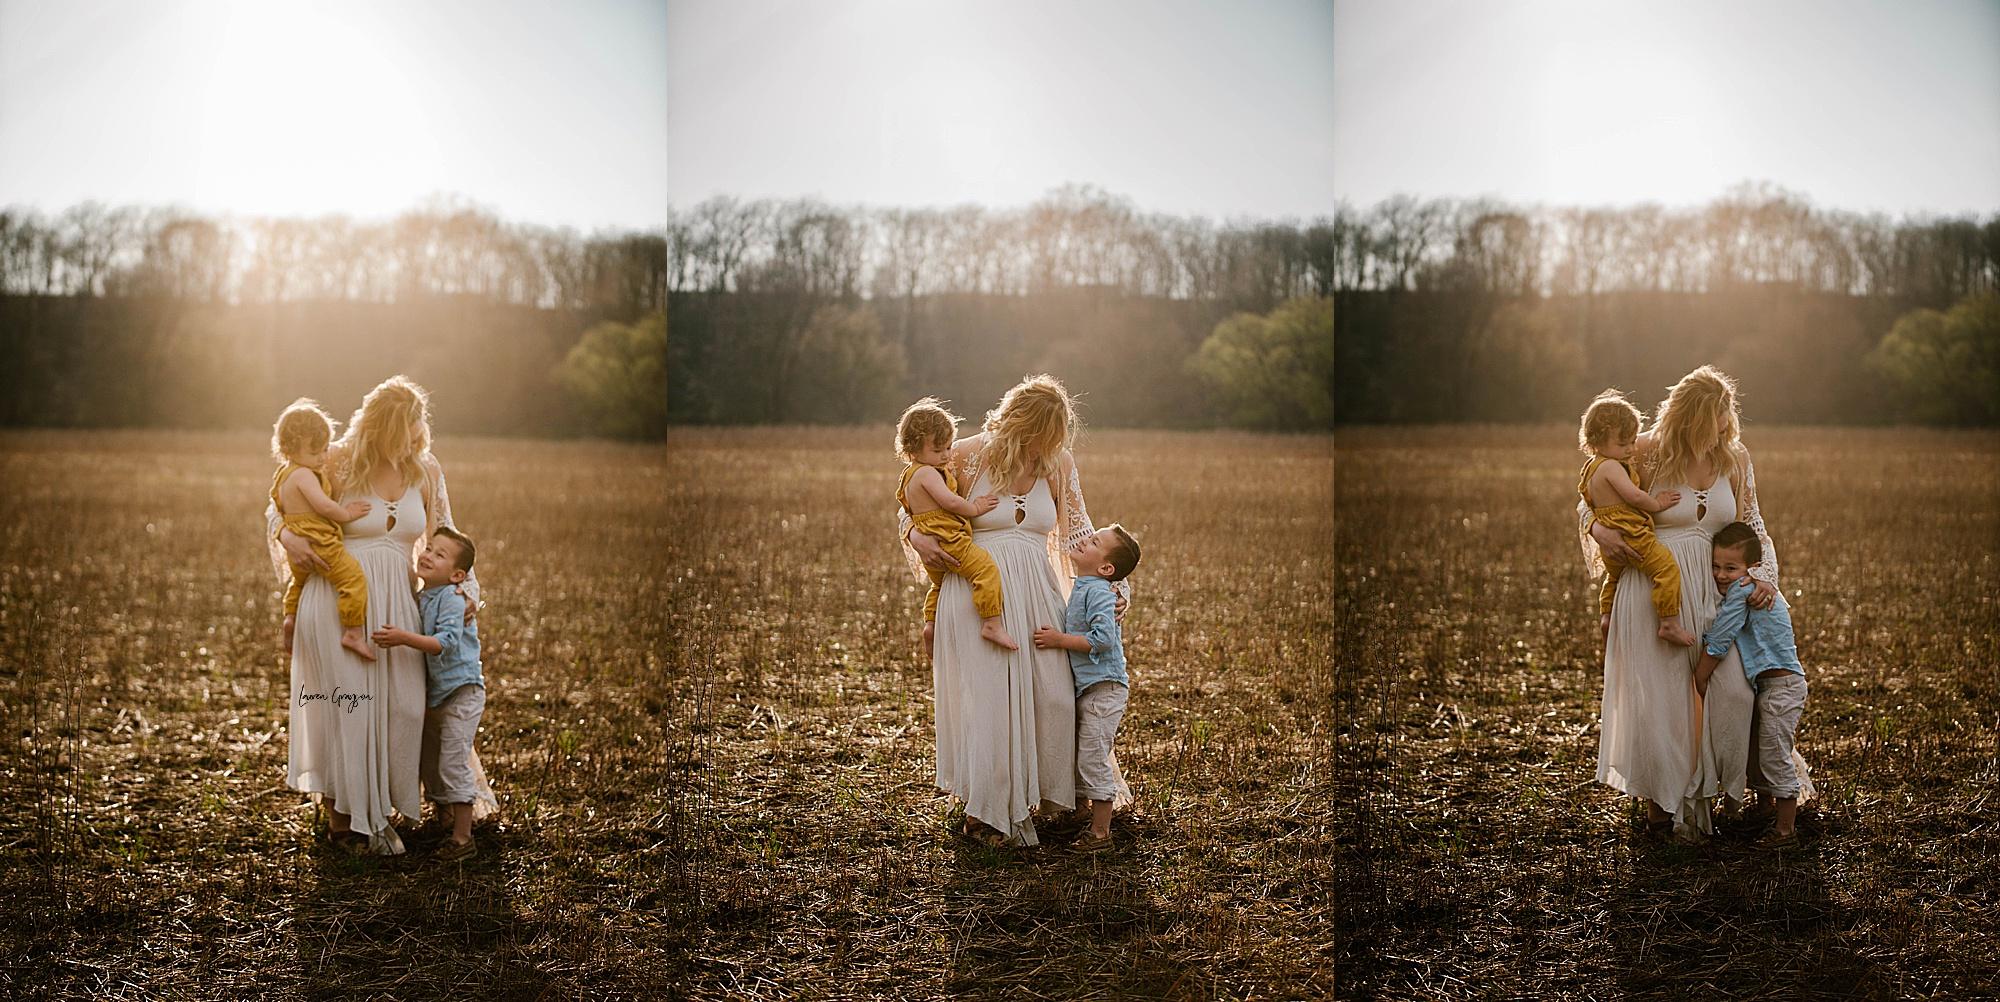 lauren-grayson-photography-akron-ohio-family-mom-boys-field-spring-outdoor-session_0014.jpg